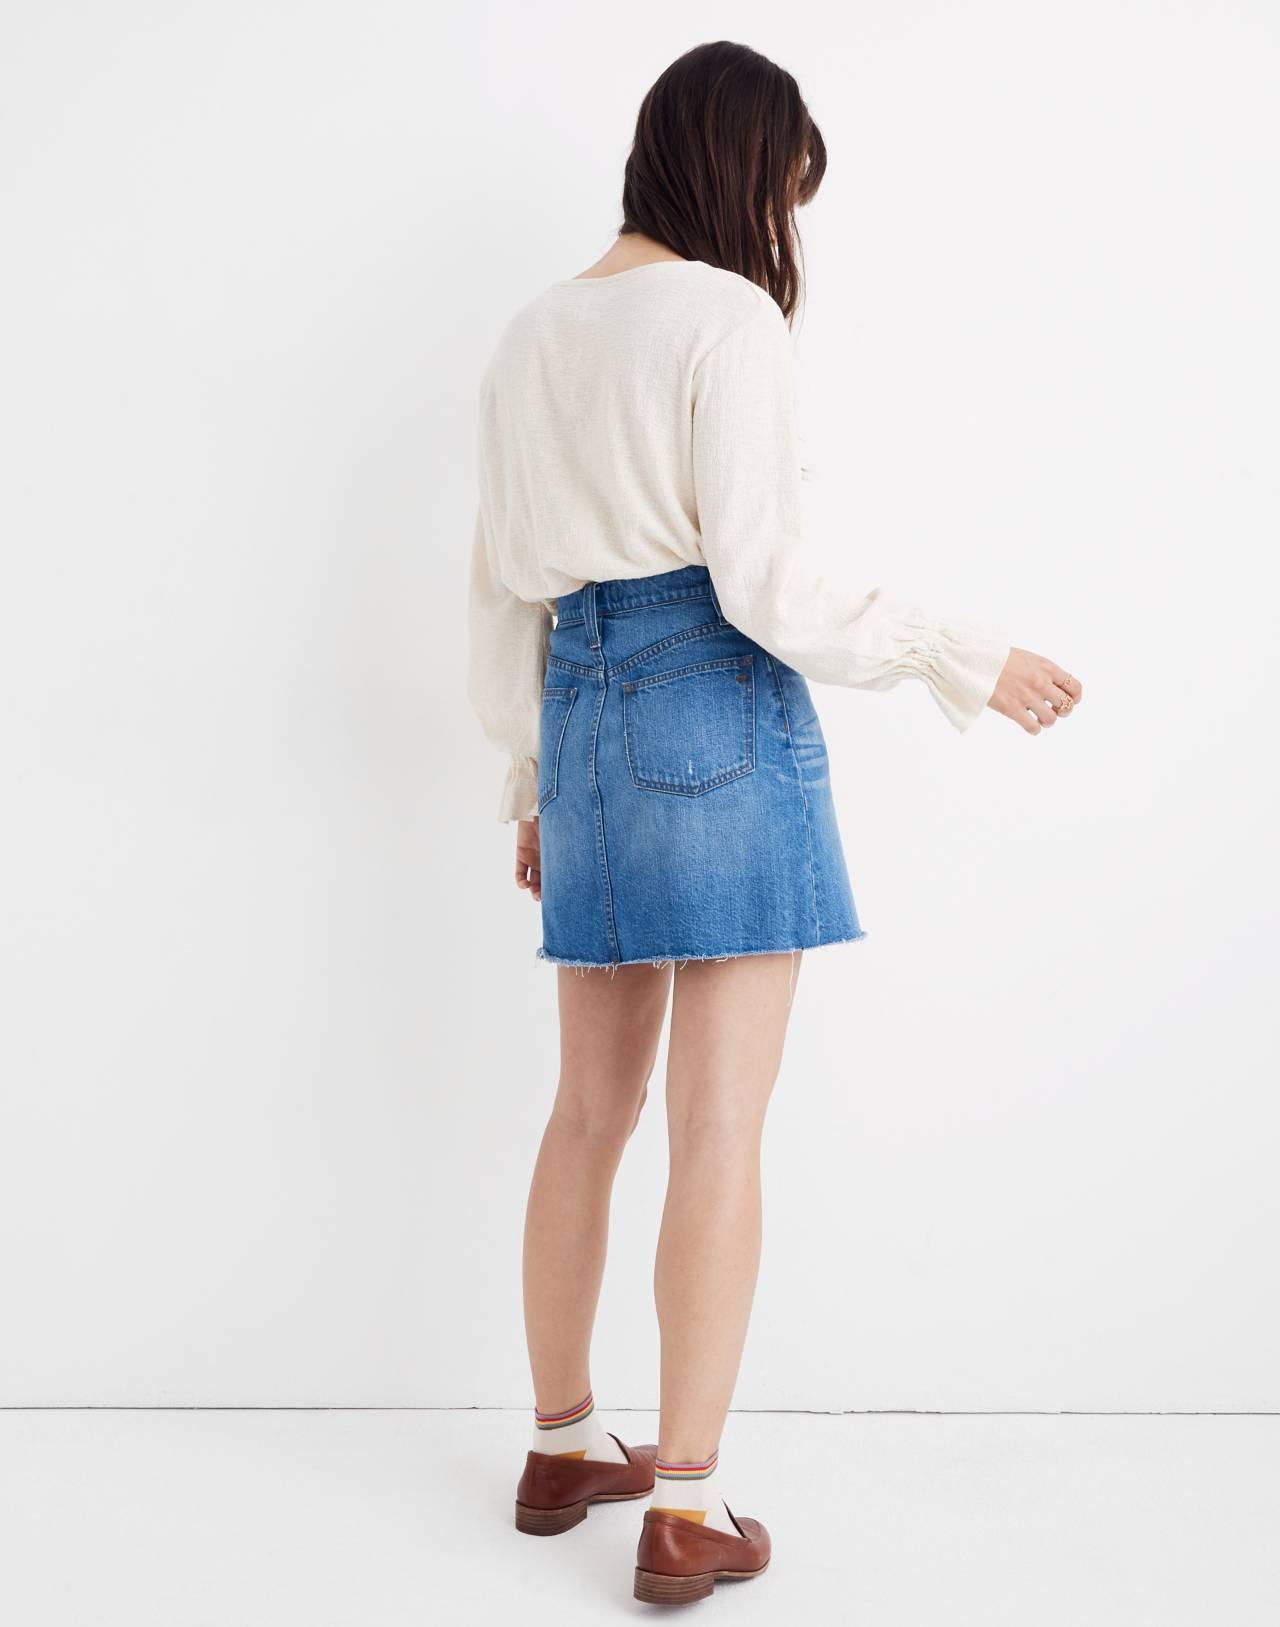 Rigid Denim A-Line Mini Skirt in Keene Wash: Cutout Edition in keene wash image 3